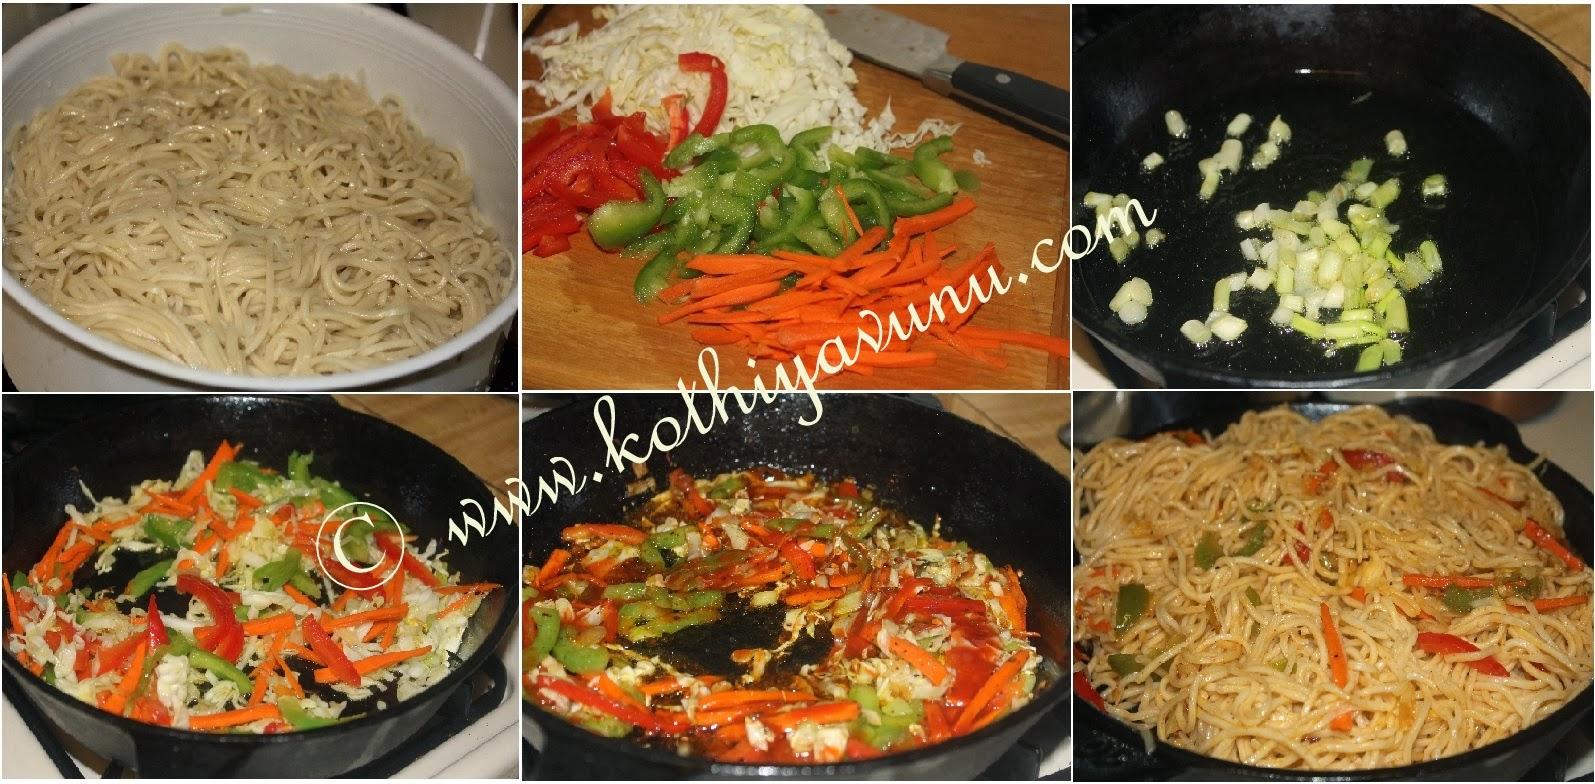 Vegetable hakka noodles chowmein recipe restaurant style how to make vegetable hakka noodles chowmein forumfinder Images